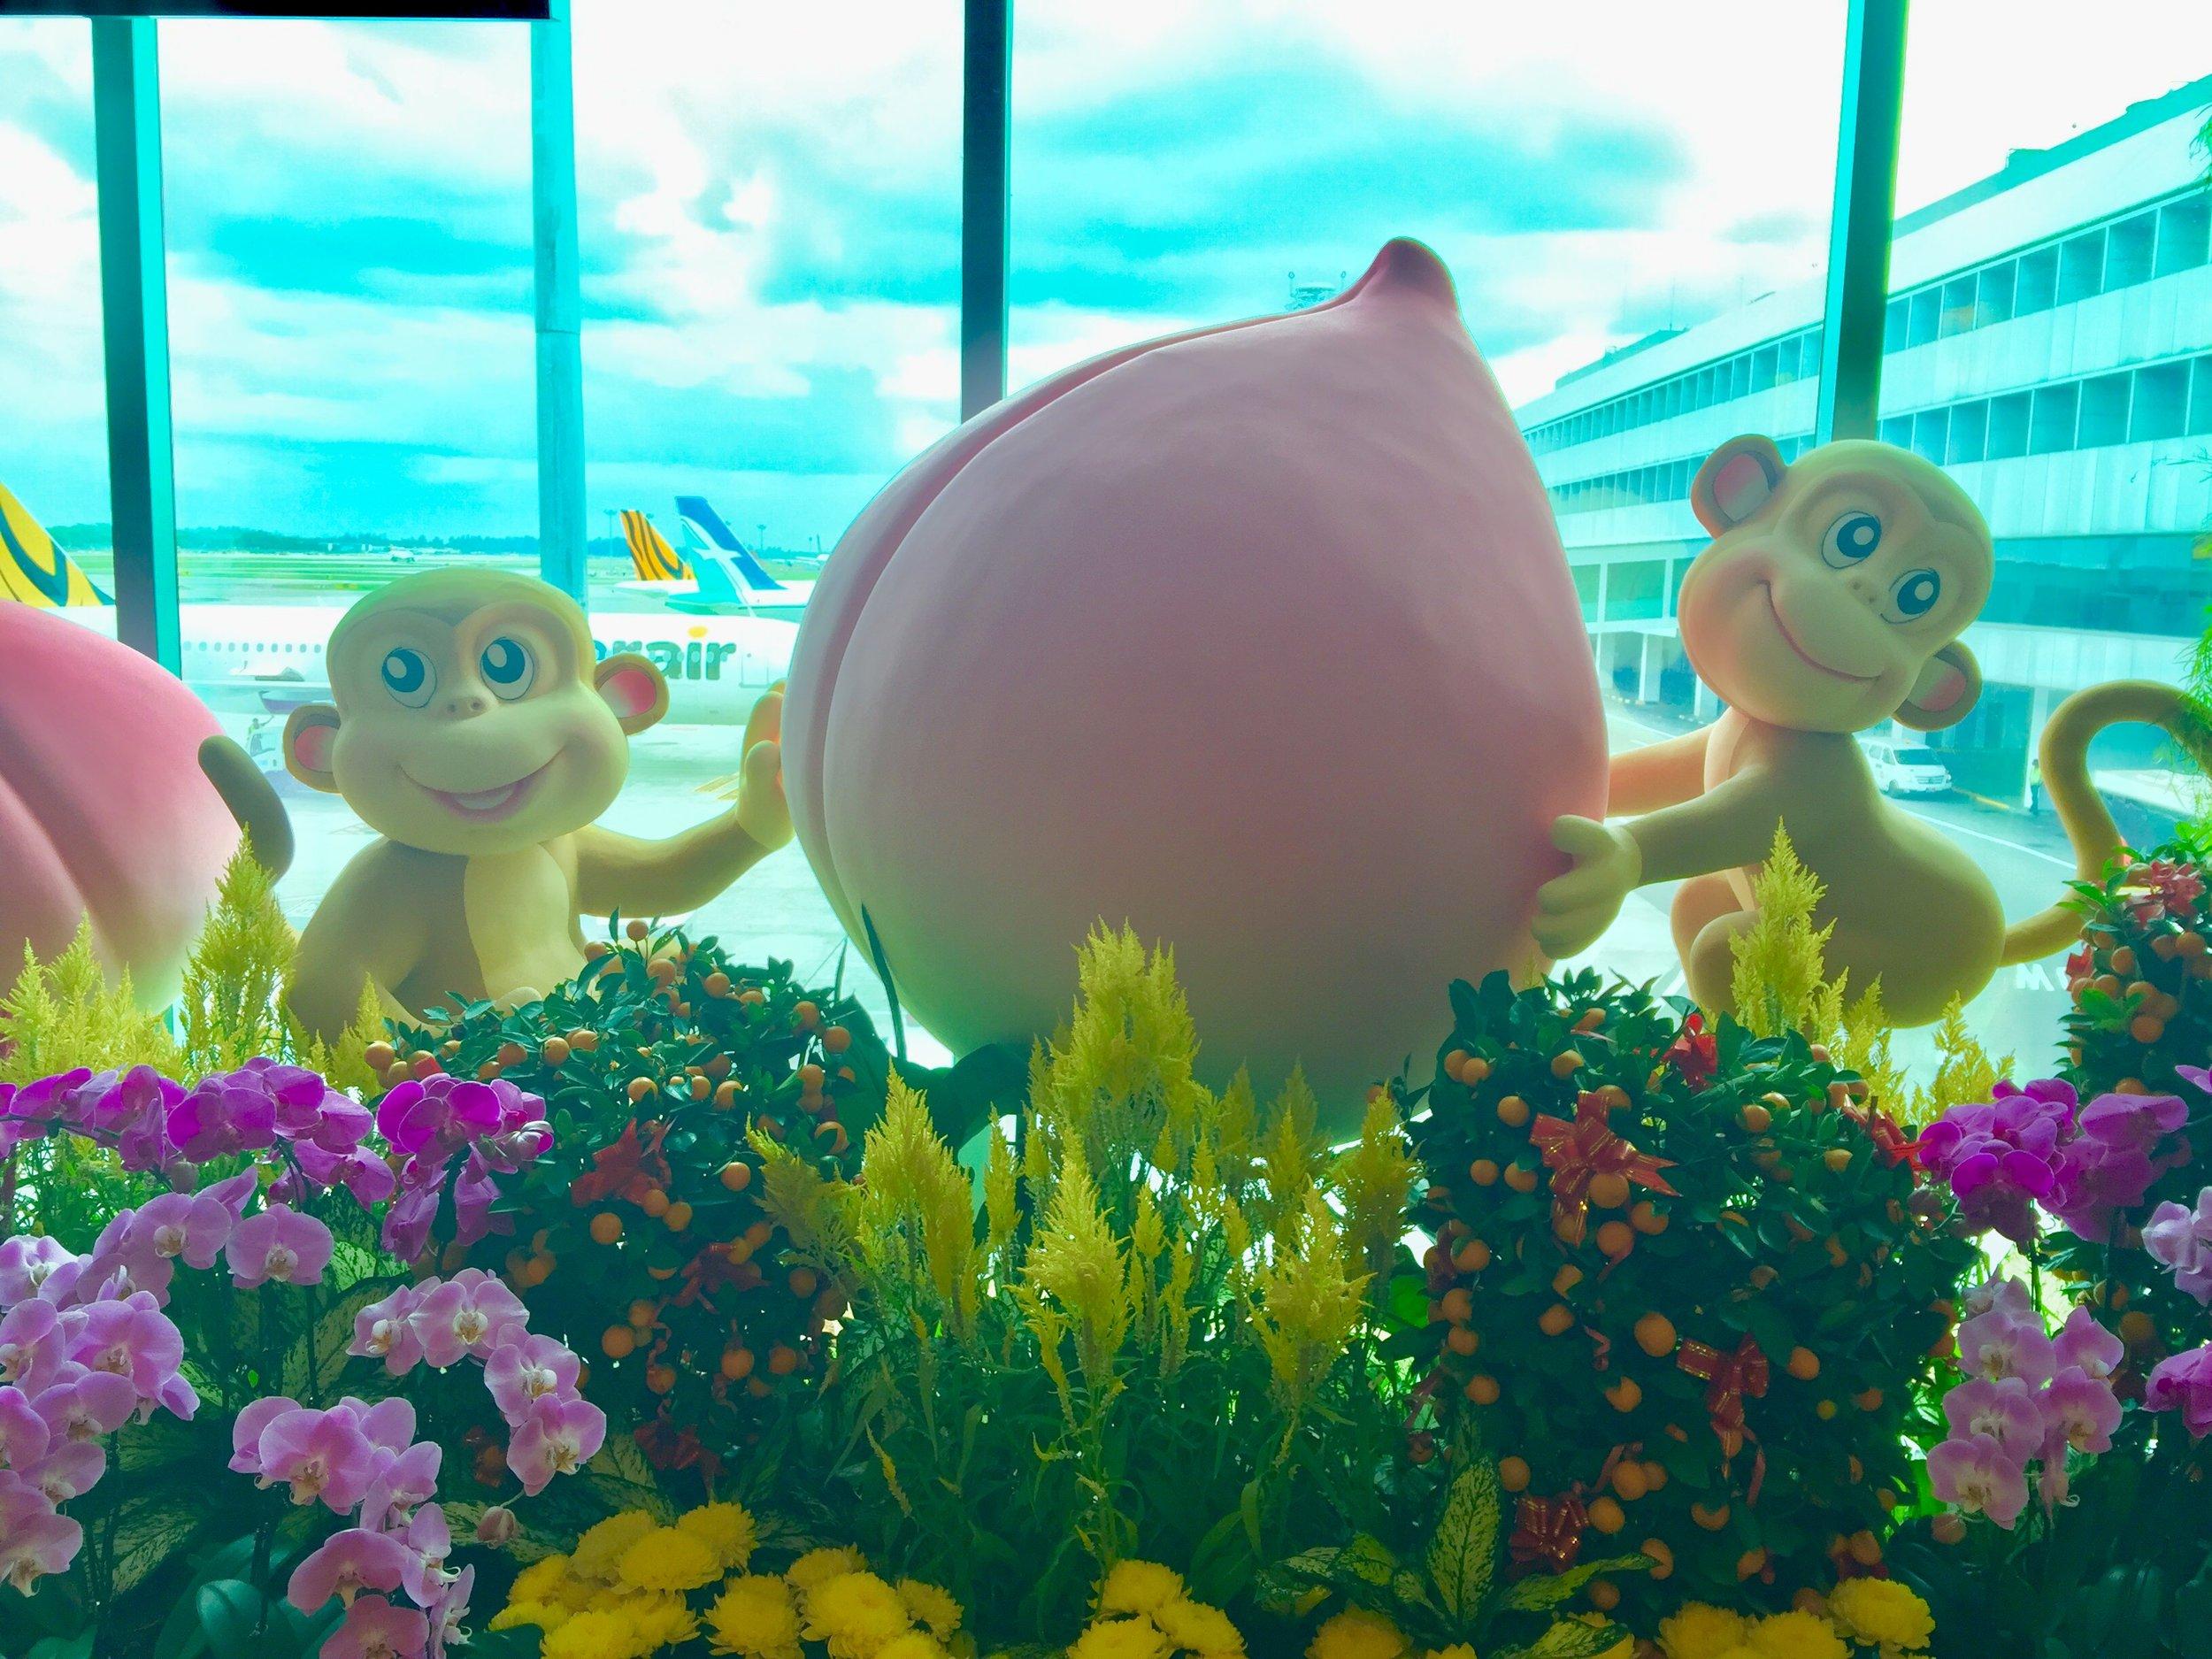 Celebrating the year of the monkey at Changi International Airport!